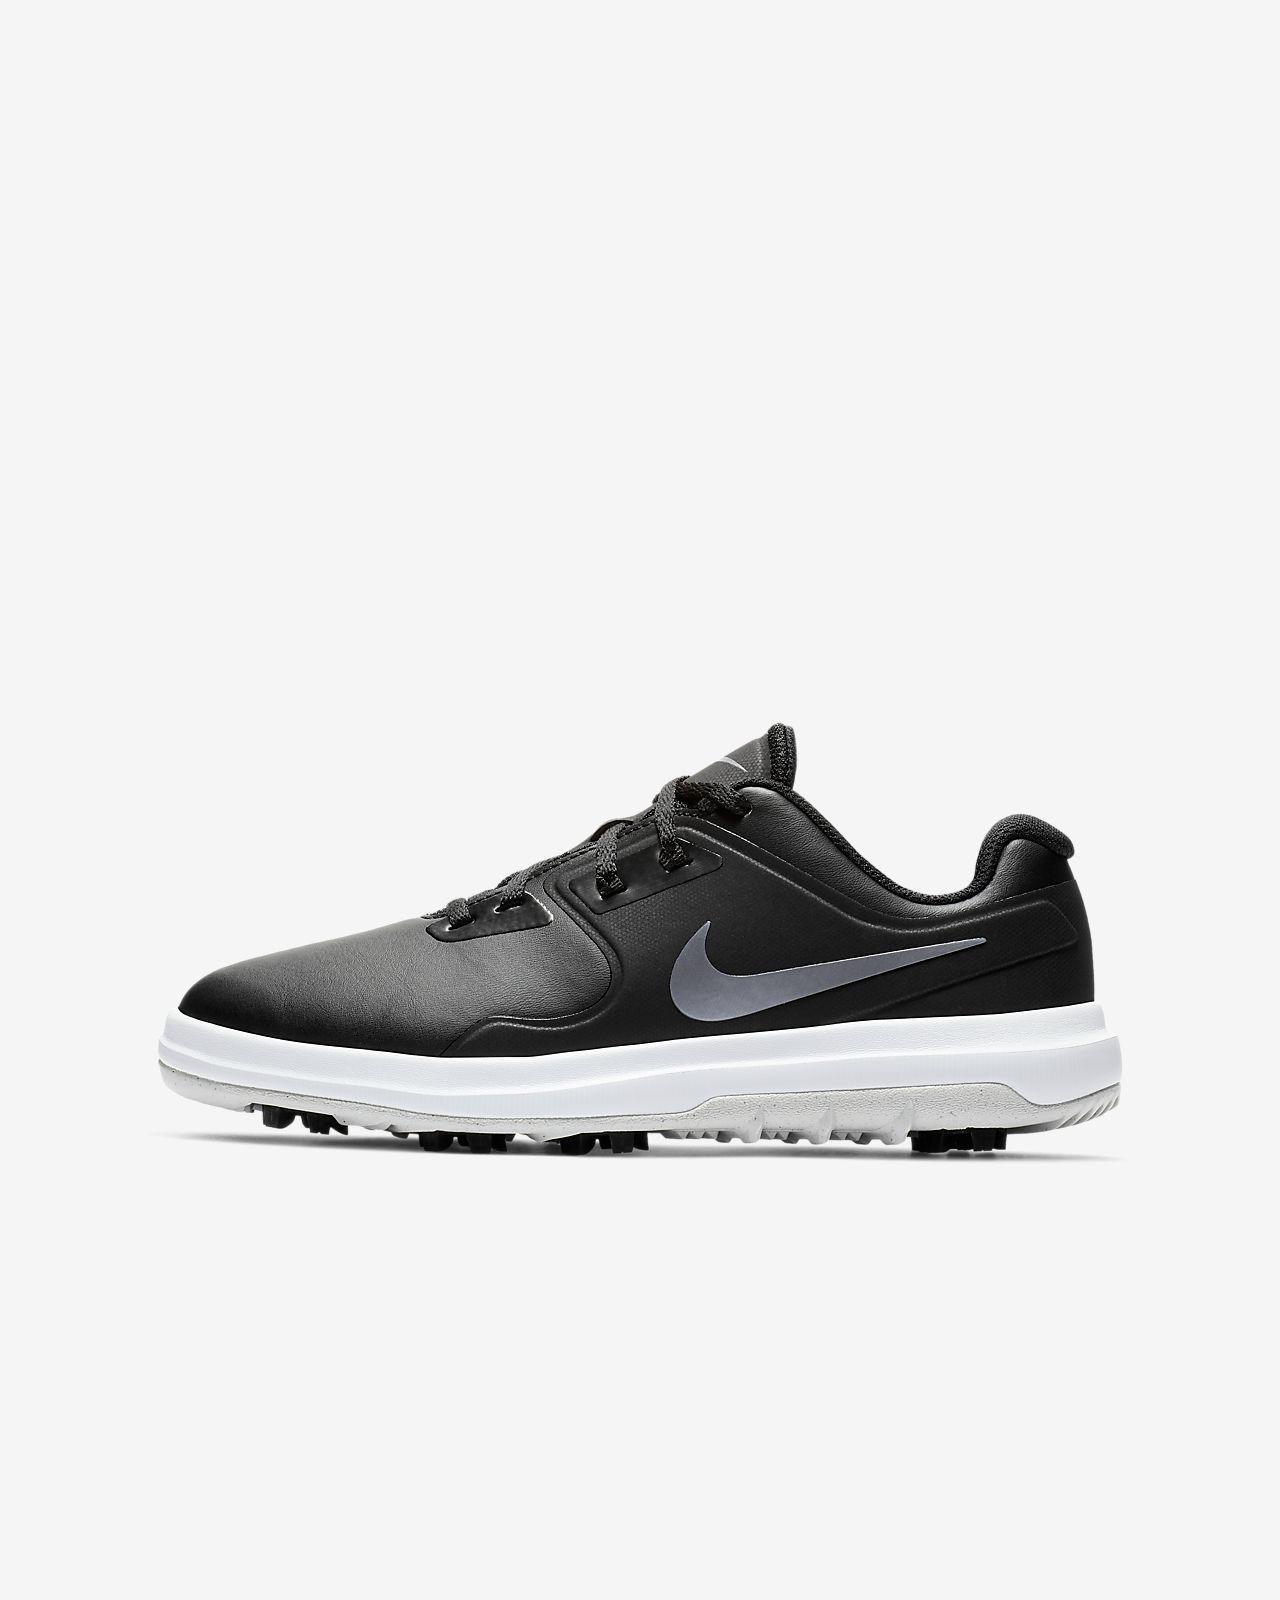 8c1d23b84faa0 Nike Vapor Pro Jr. Zapatillas de golf - Niño a y niño a pequeño a ...